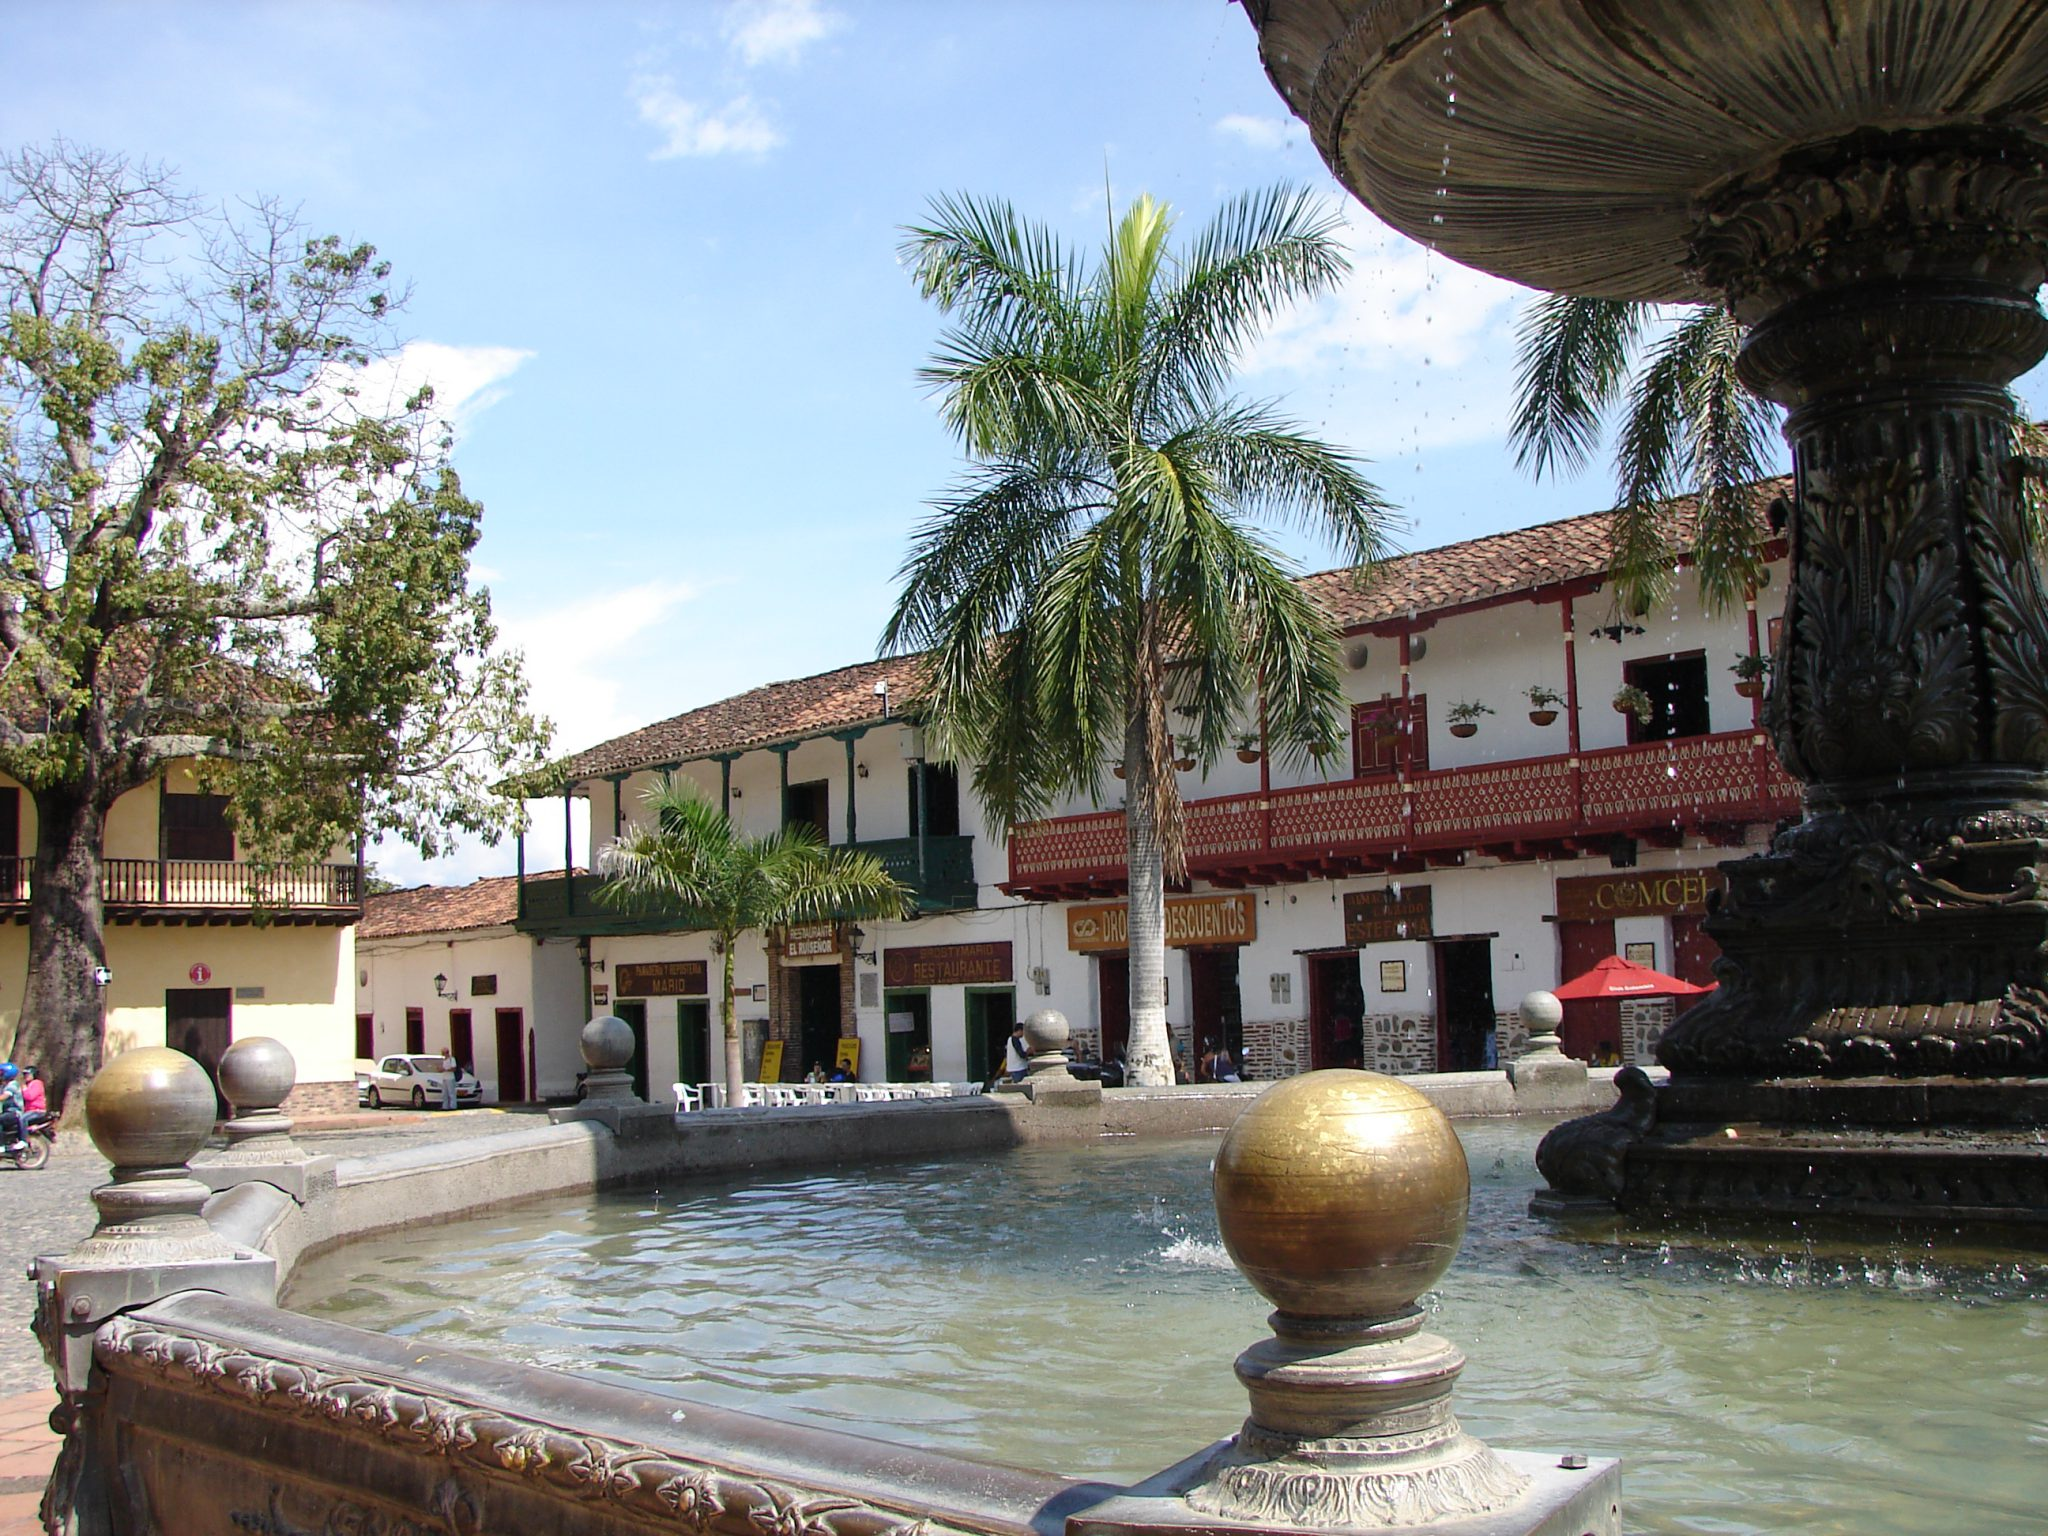 Santa fé de Antioquia, un lugar colonial tradicional